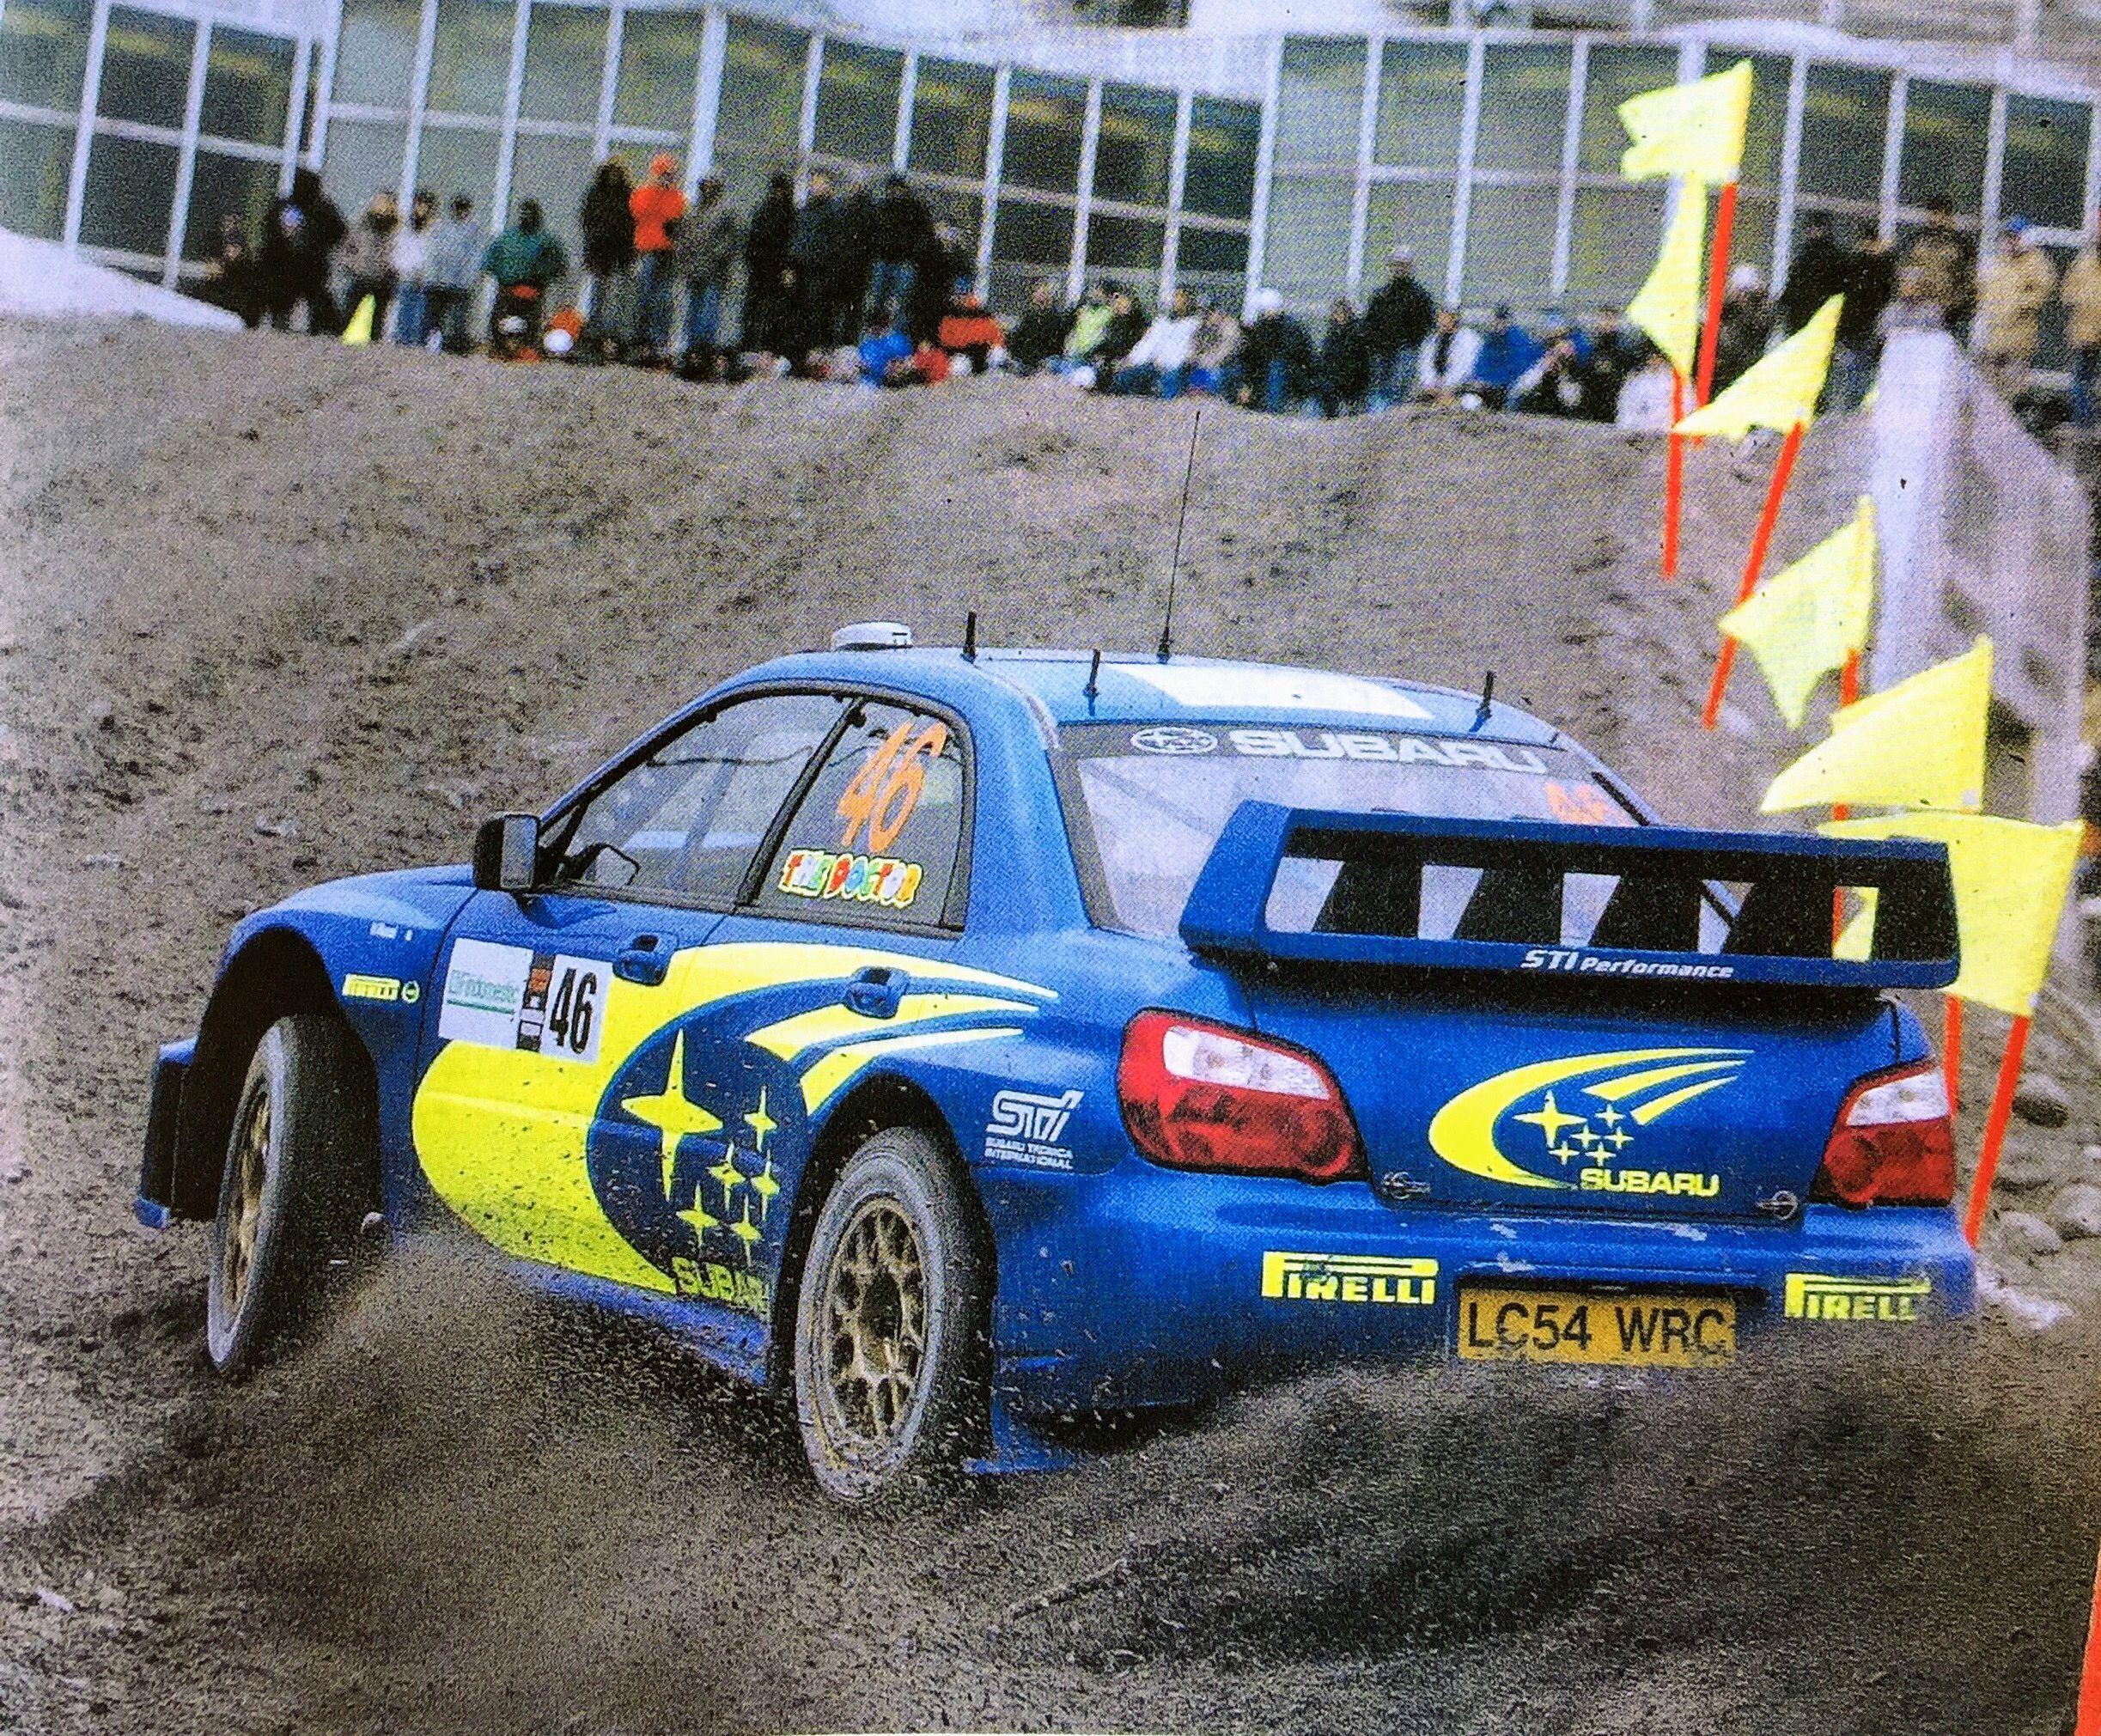 Valentino Rossi 2005 Subaru Cars Subaru Wrc Subaru Impreza Wrc